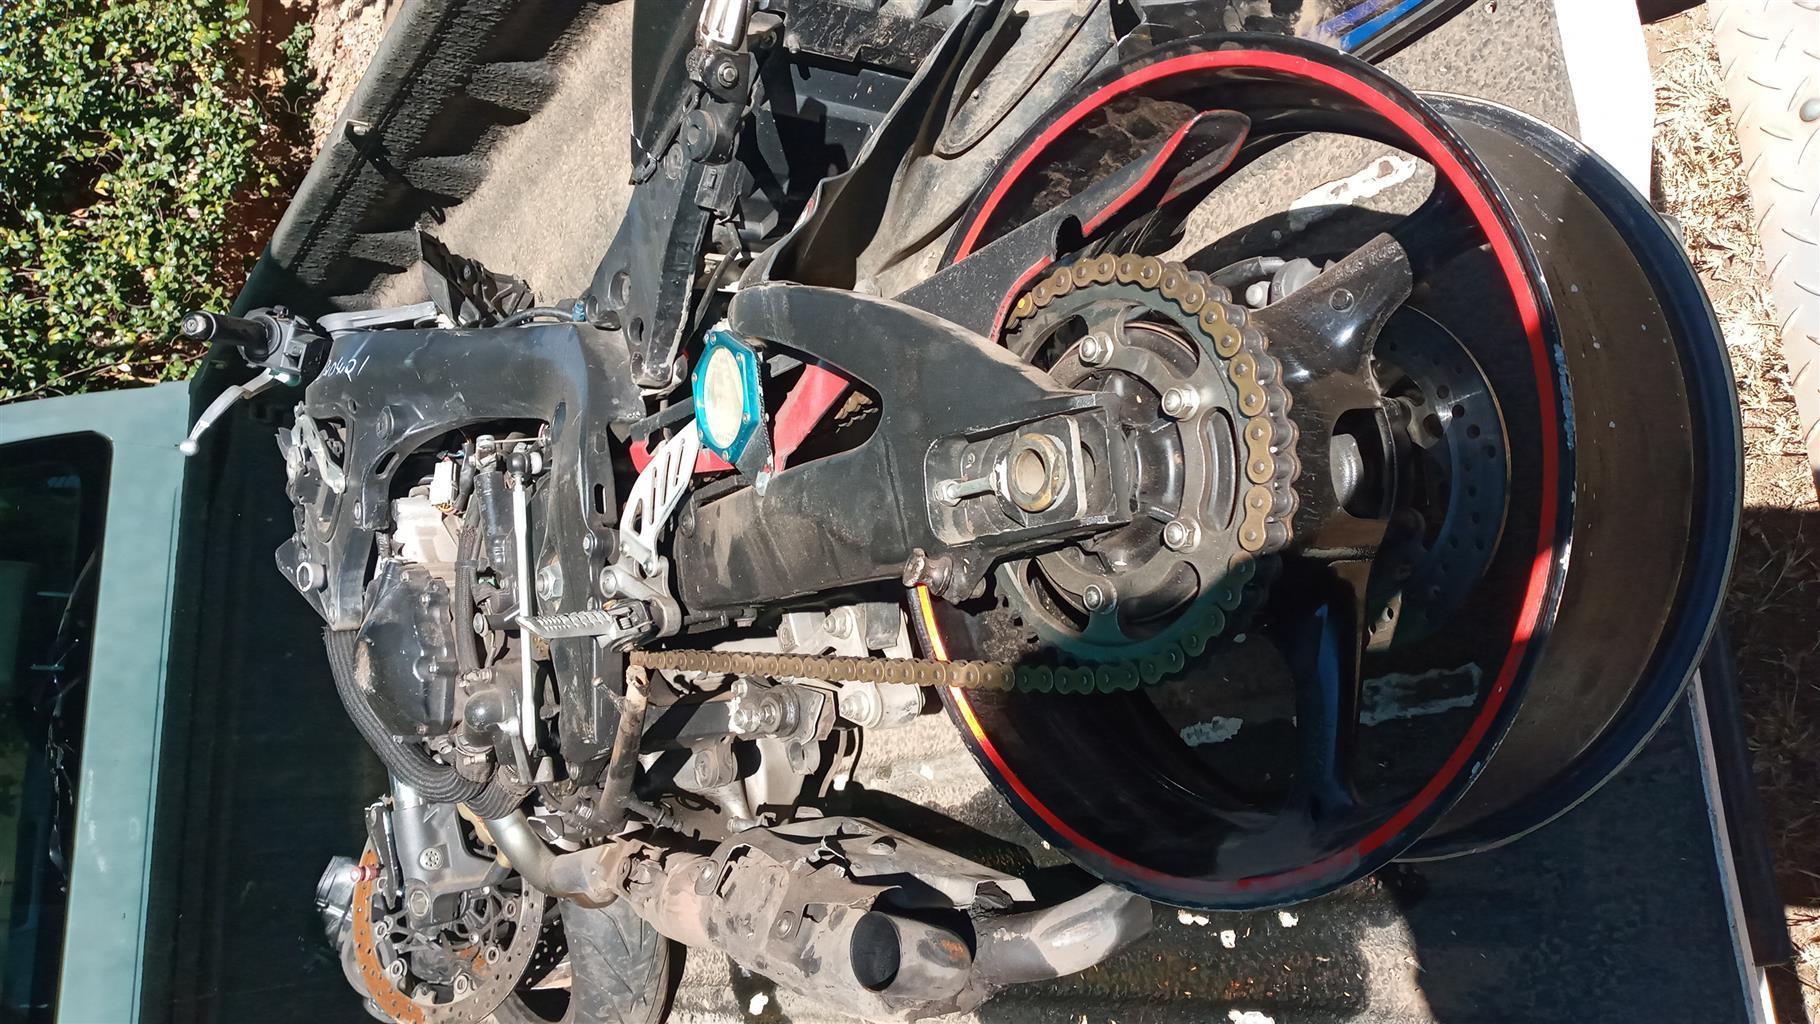 2009 suzuki gsxr 1000 braking up for spares or complete R18000 enjin stil good